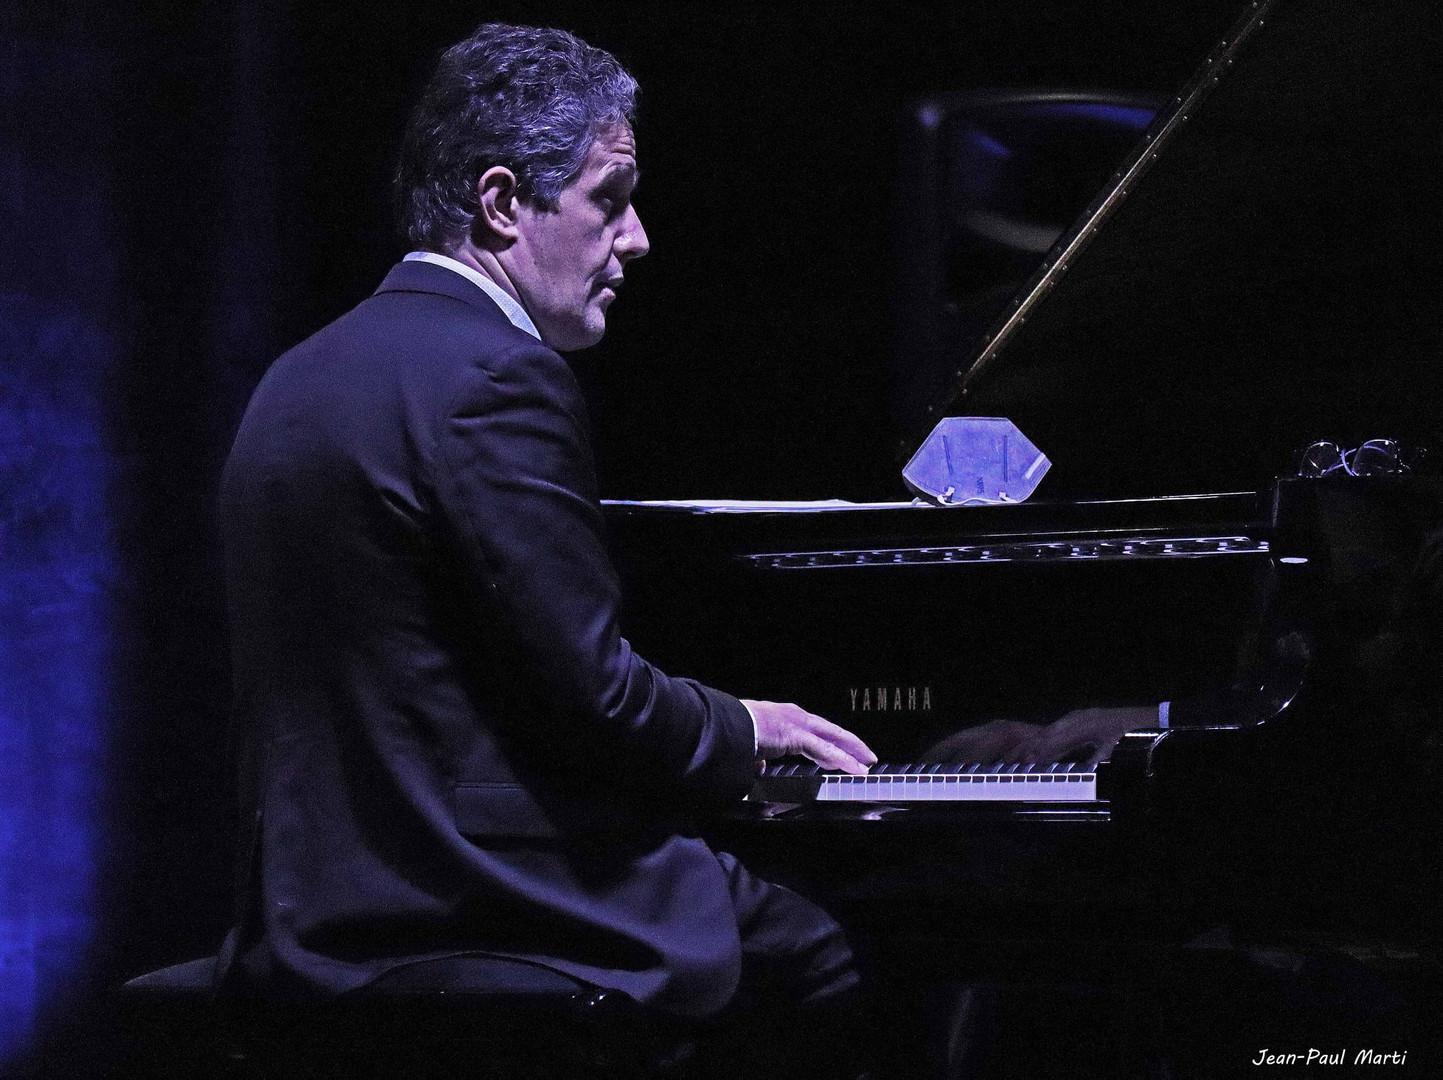 Pierre Christophe